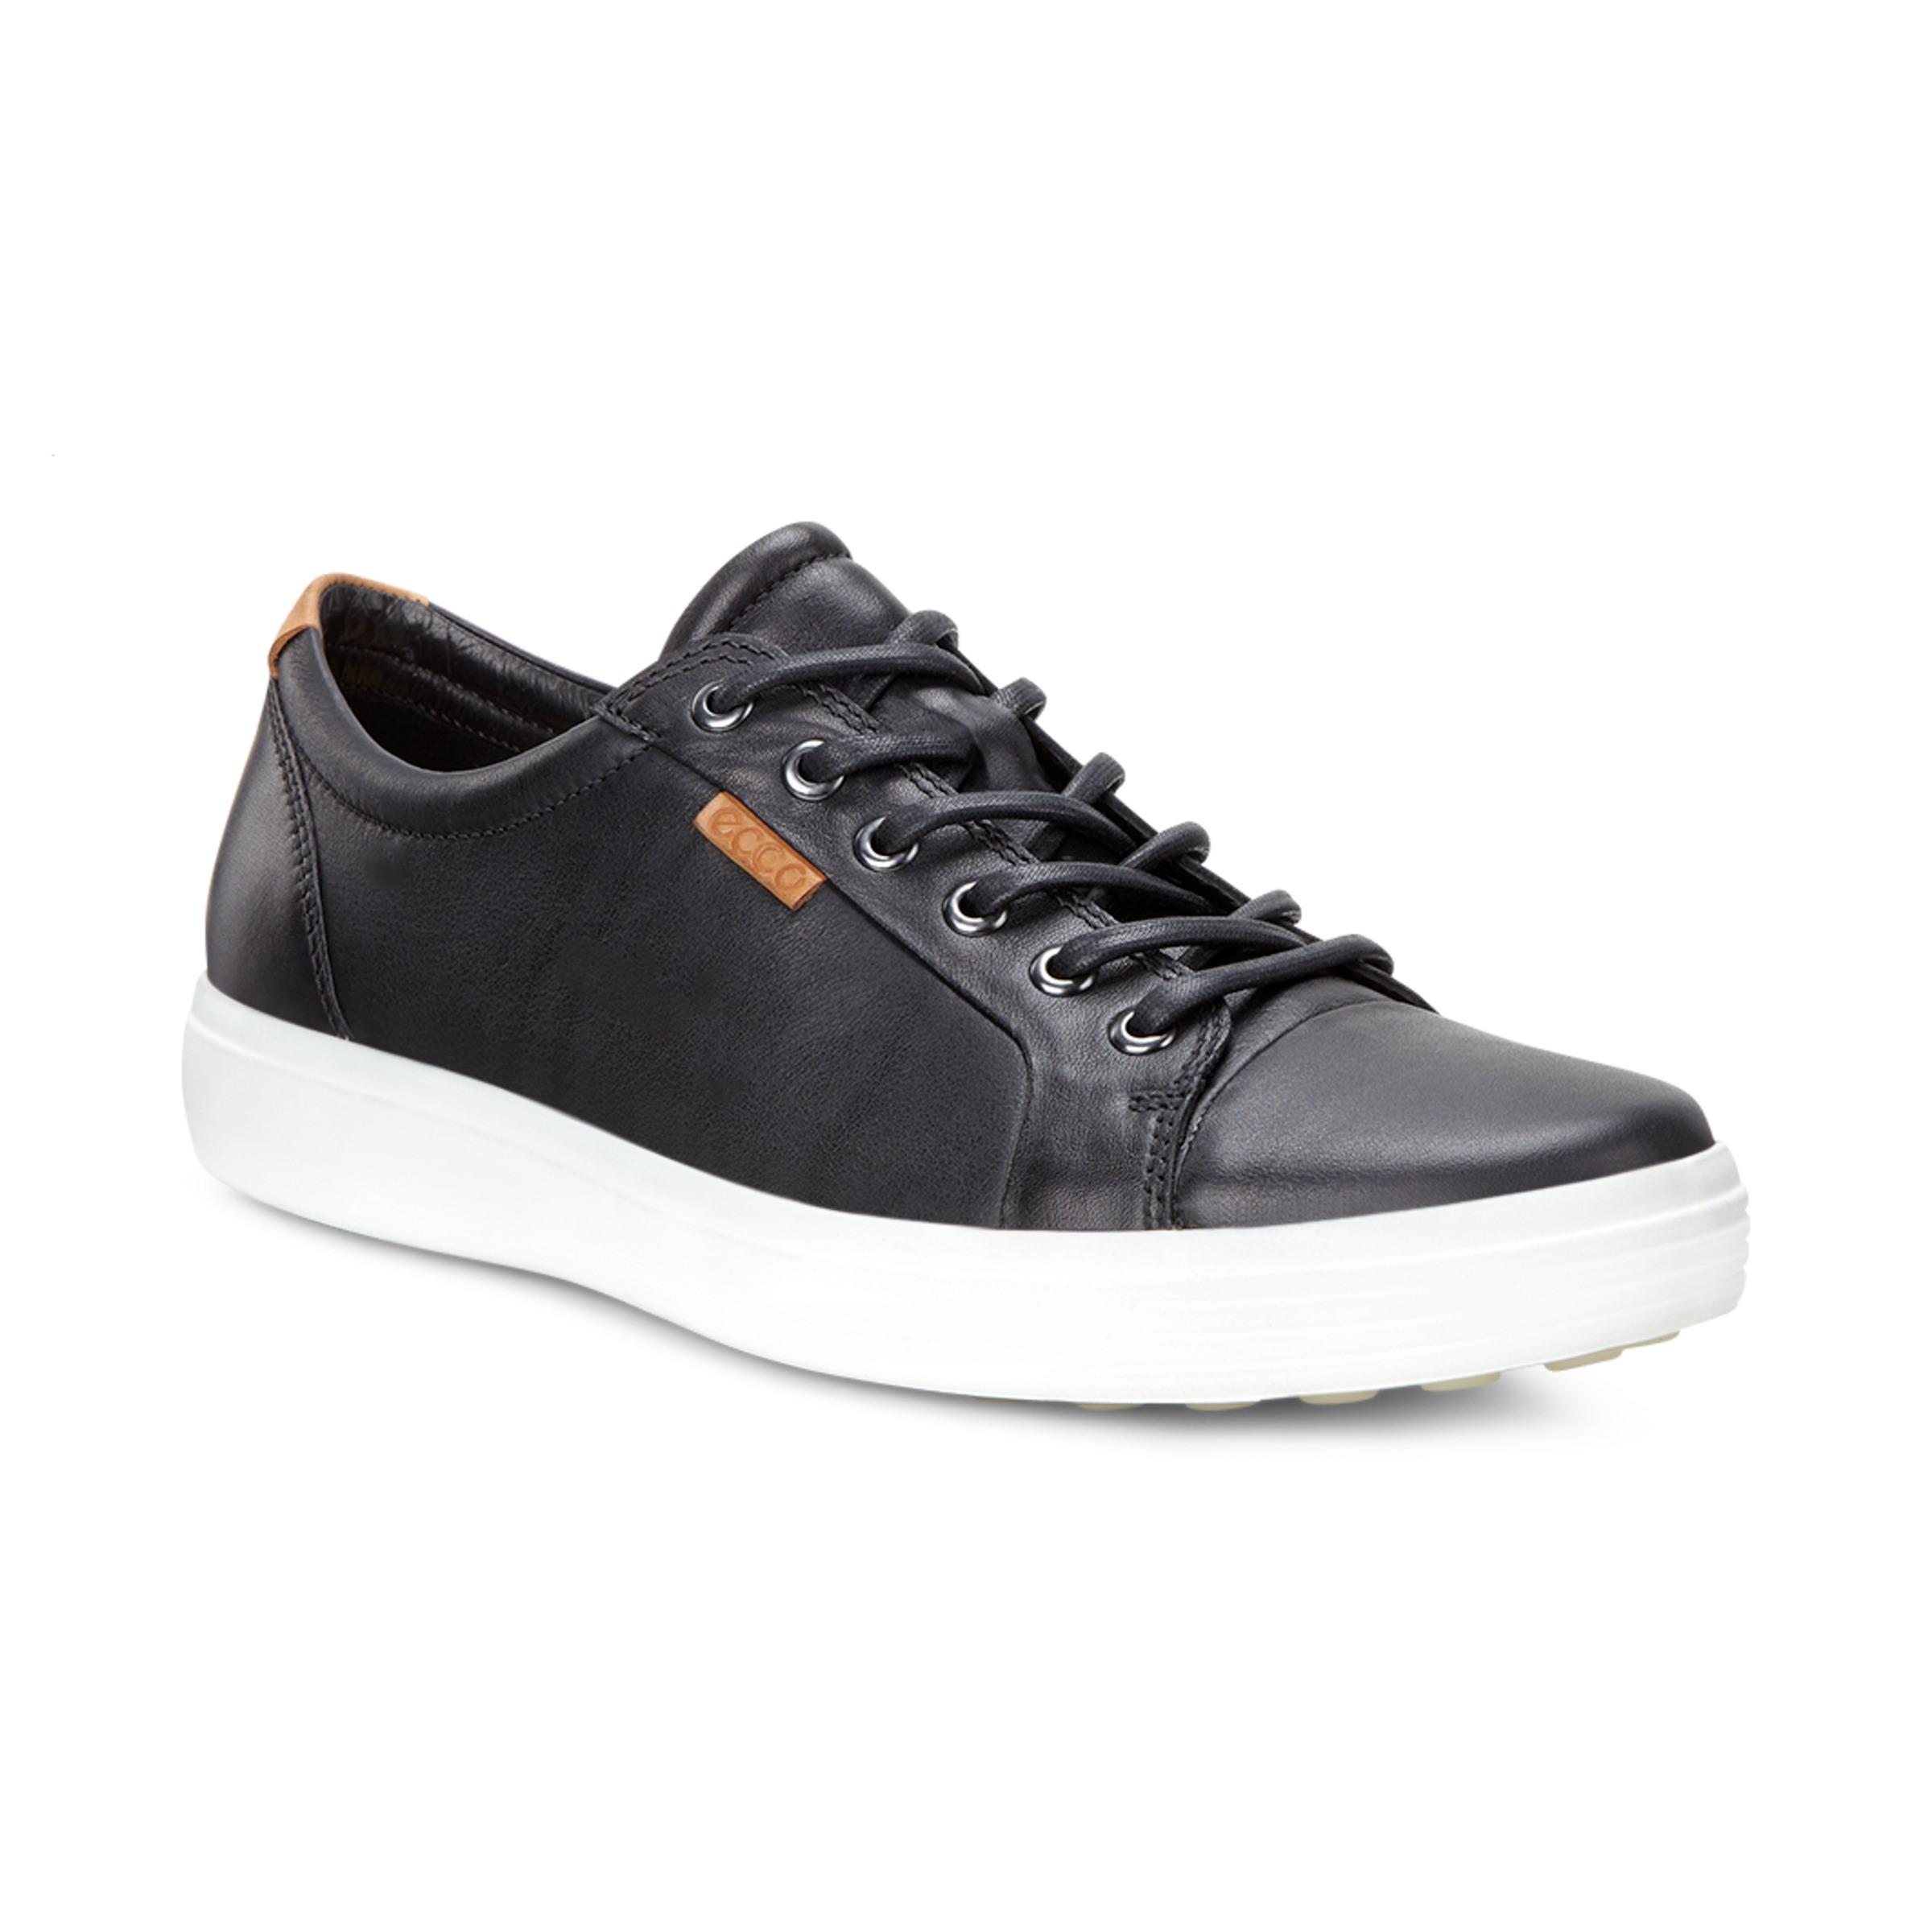 Ecco 430004 Soft shoe